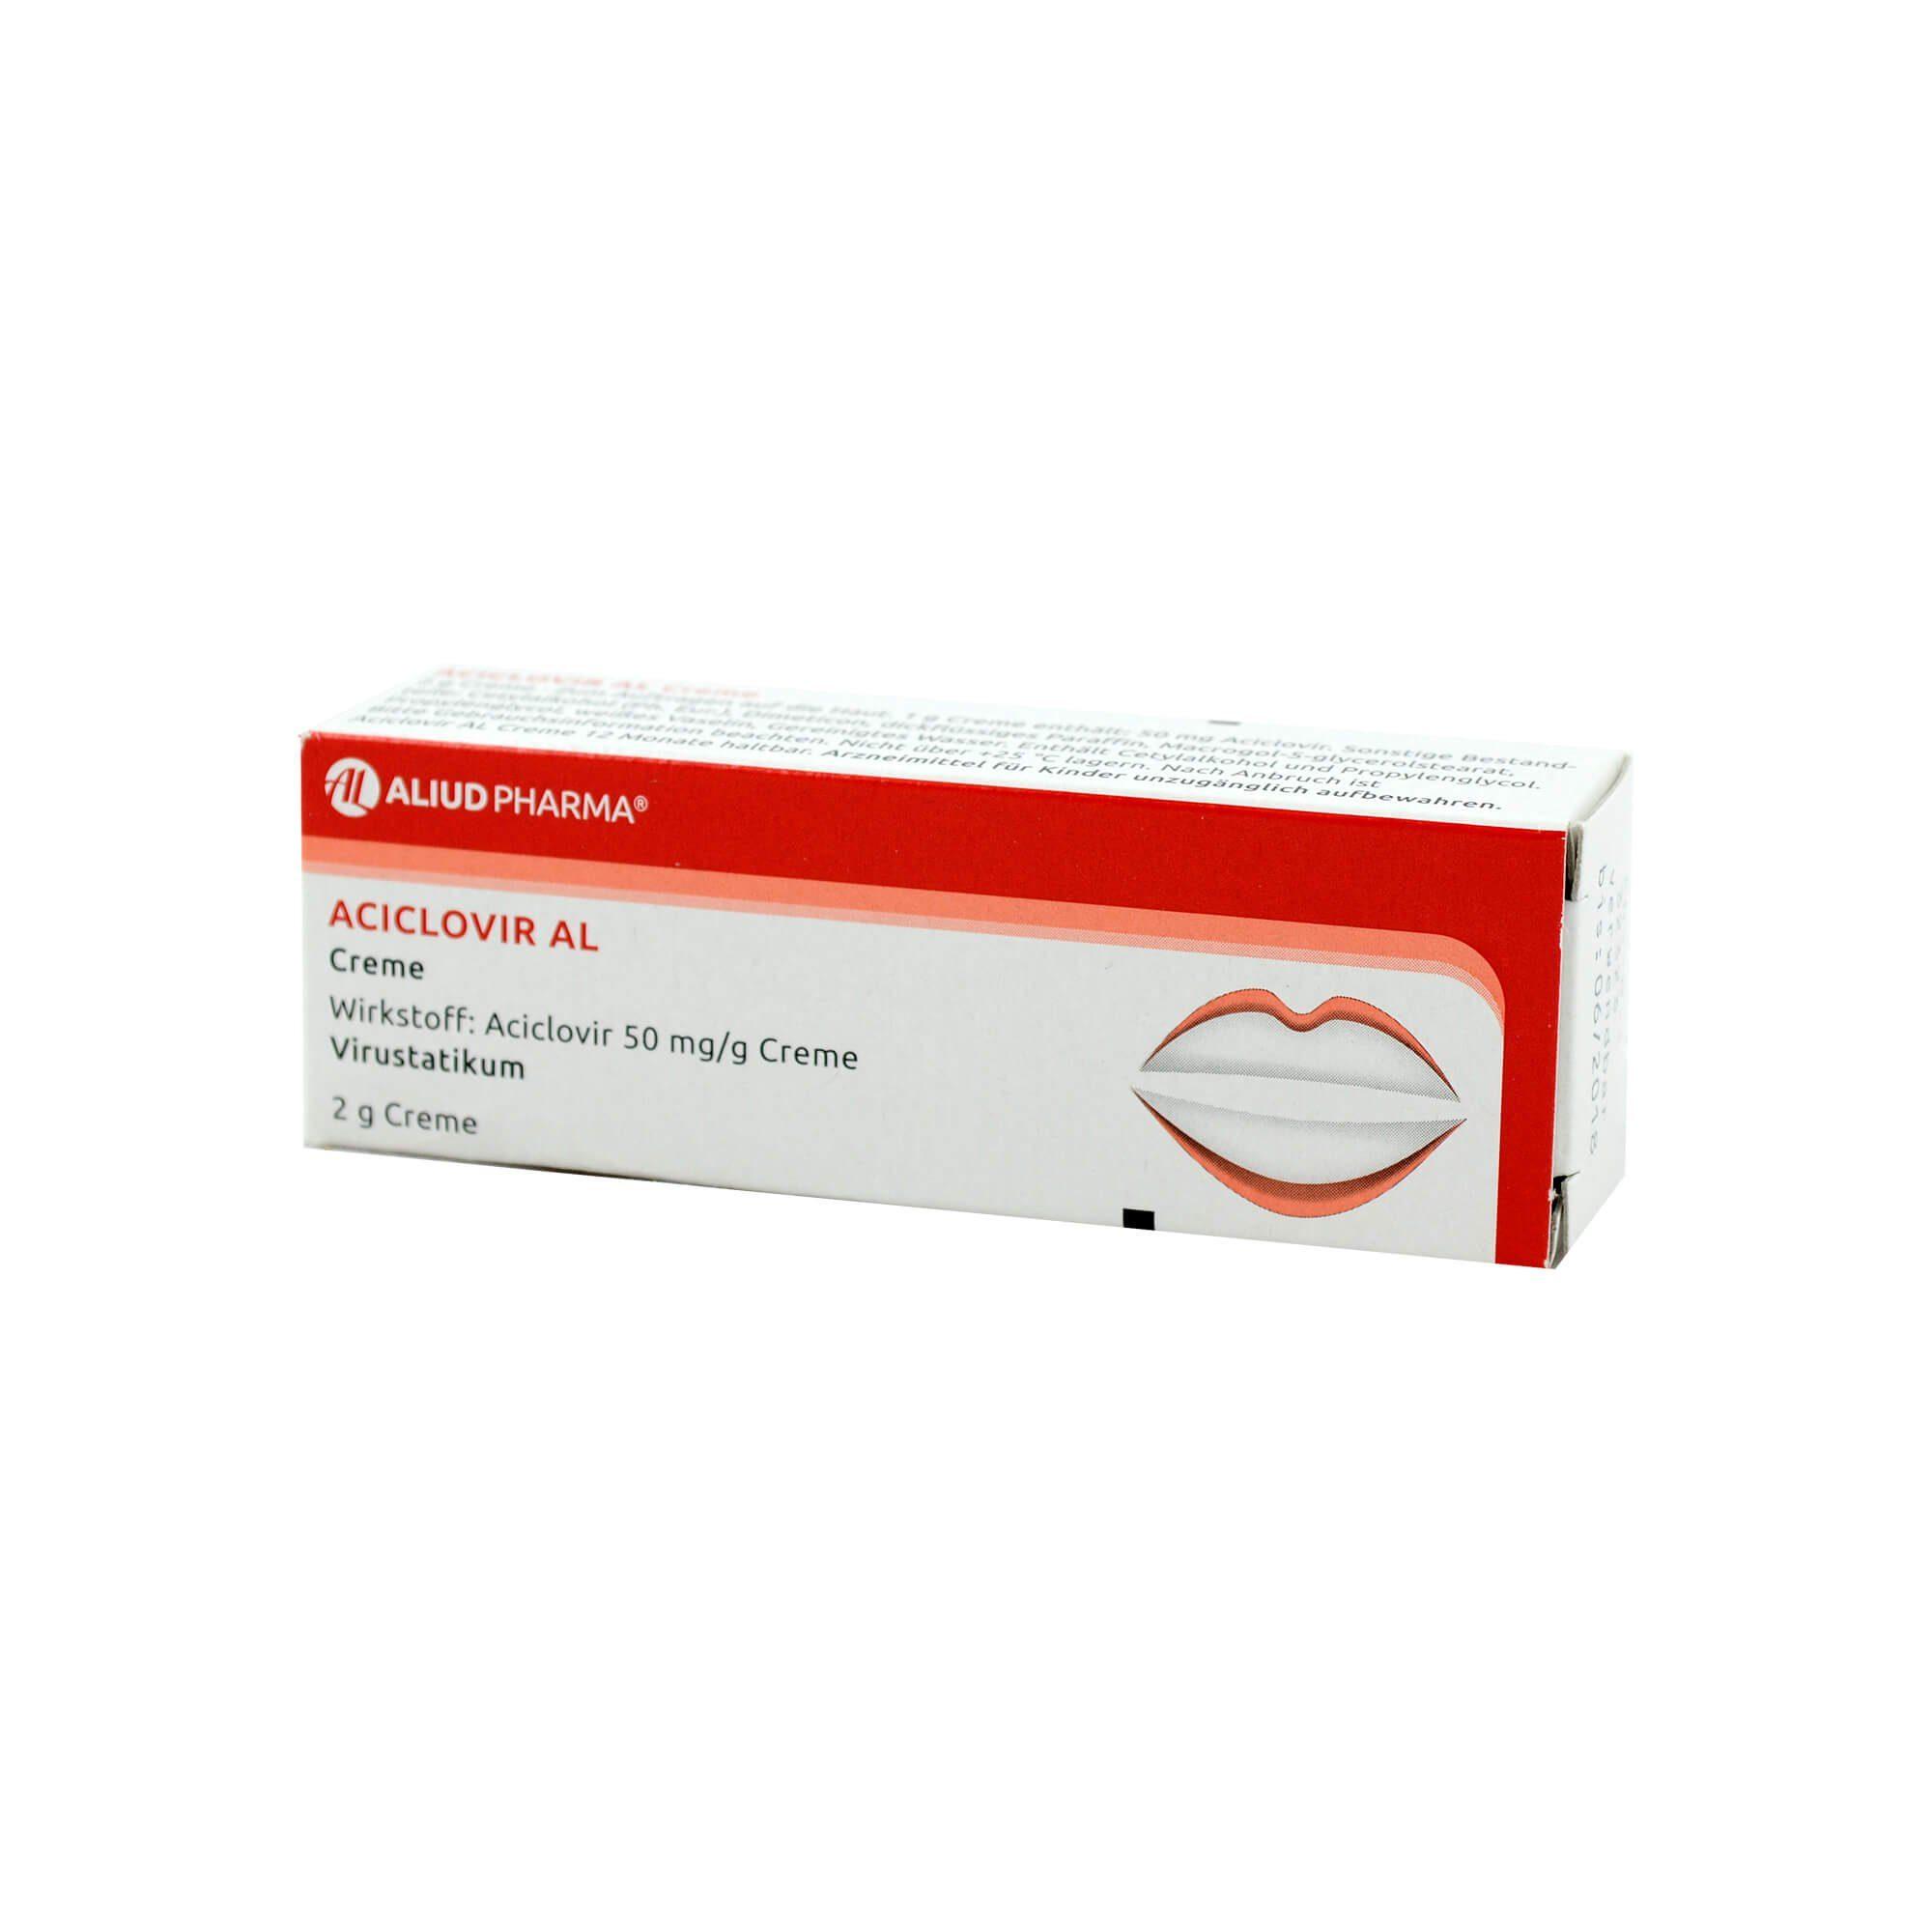 Aciclovir AL Creme , 2 g